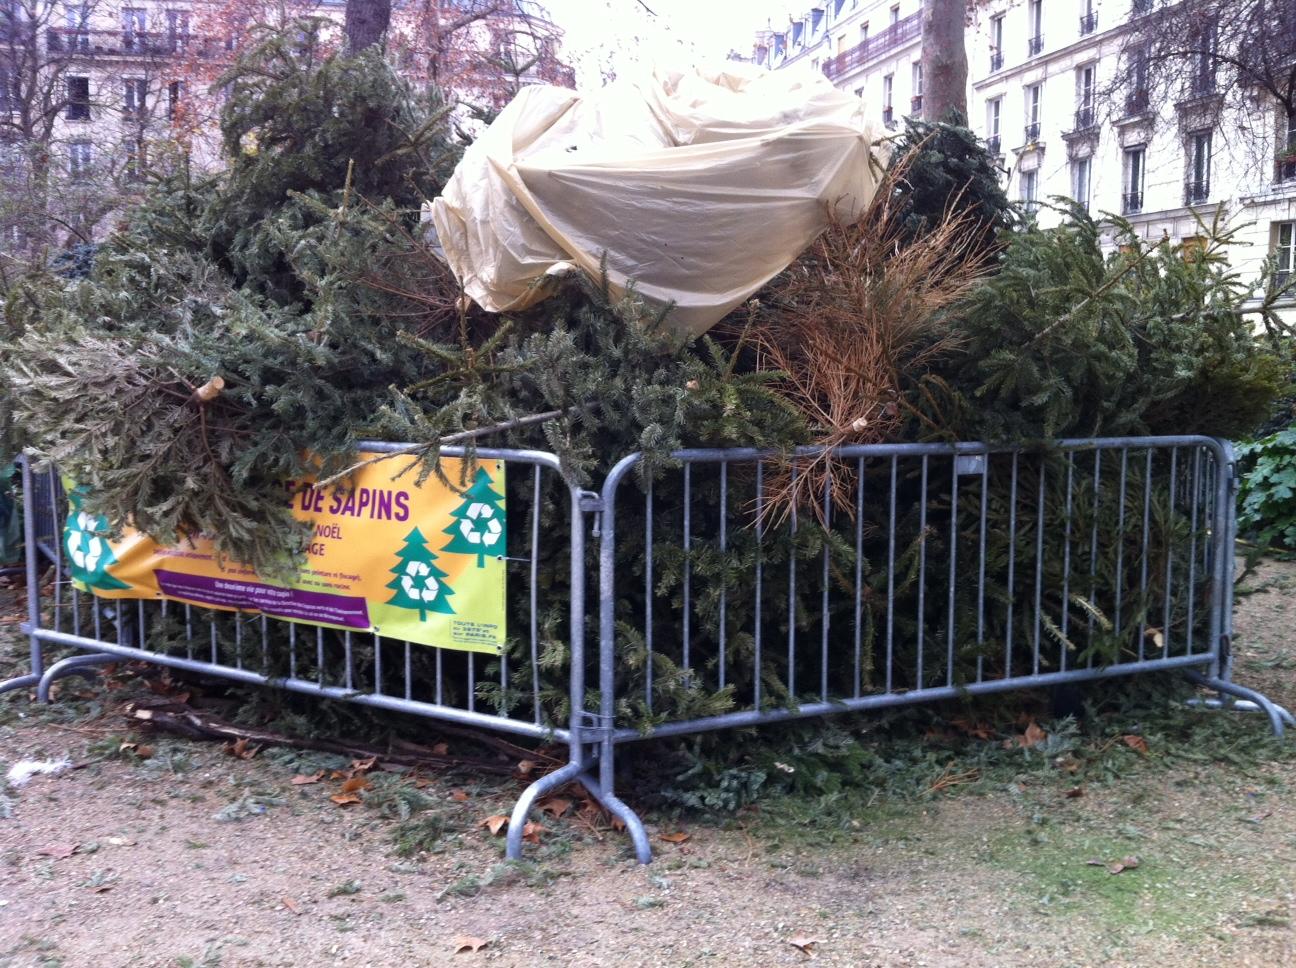 2012-01-10-images-Xmastreerecyclingsmall.JPG